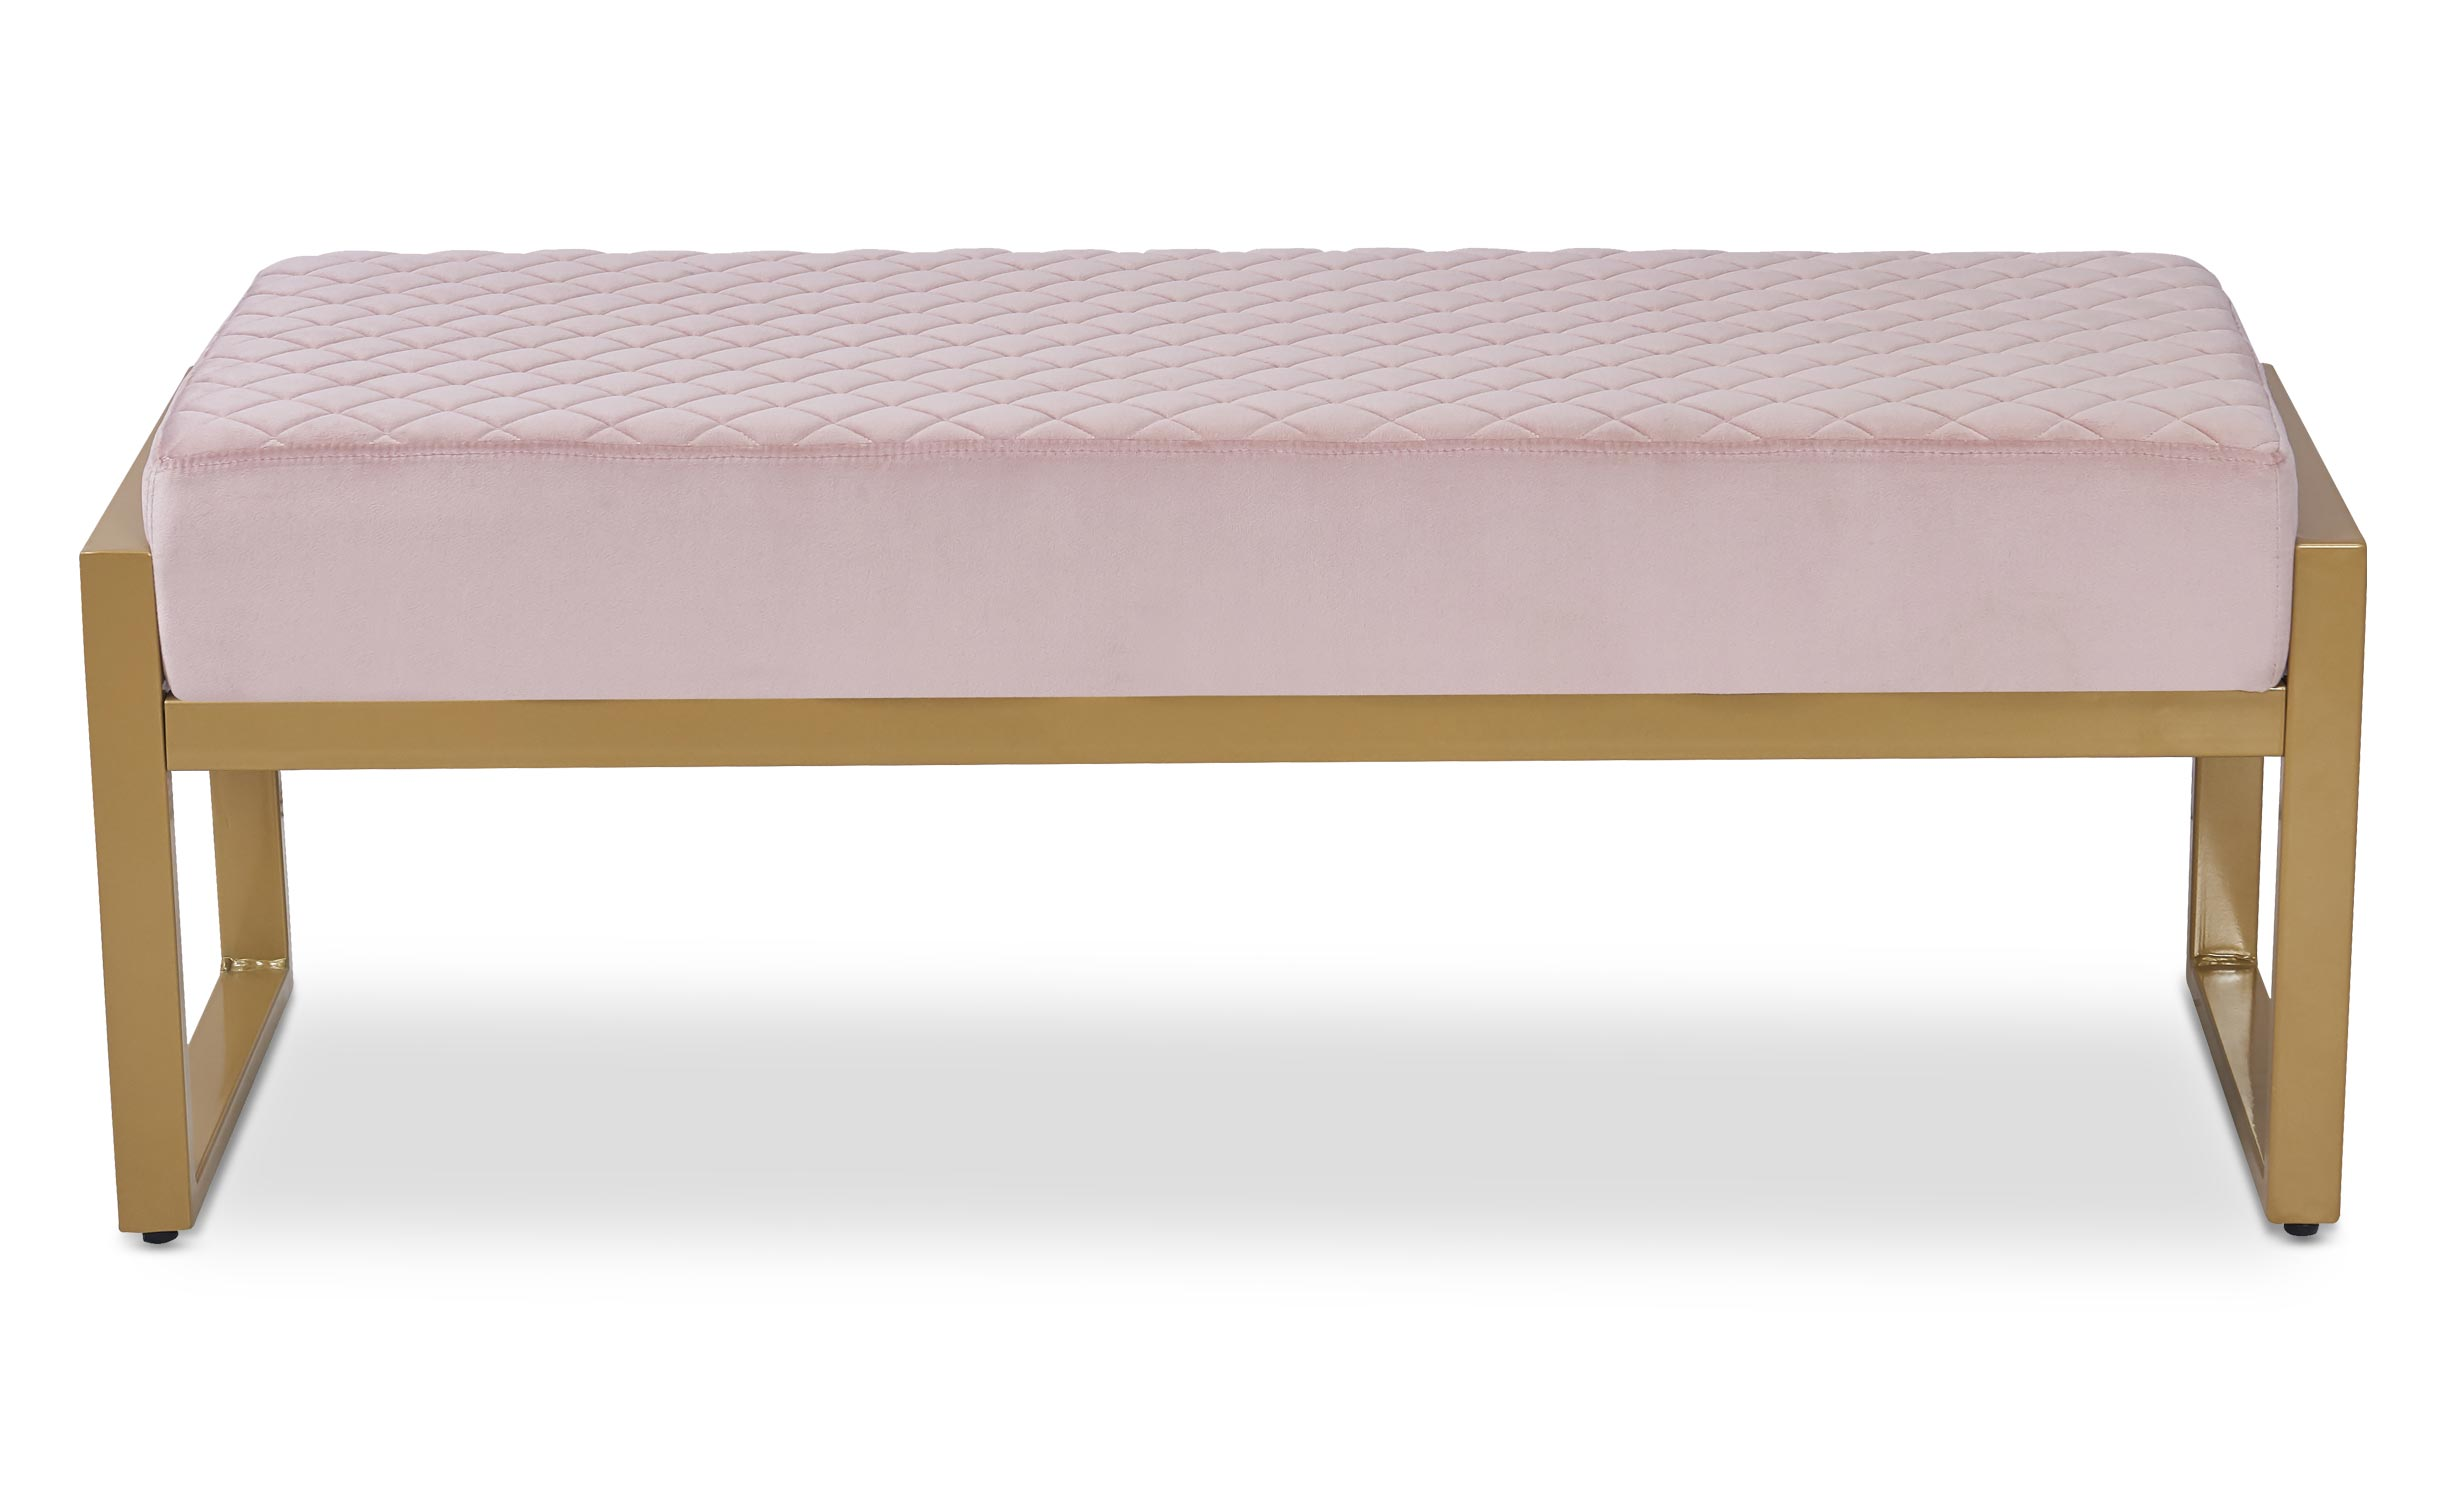 Panca Madison Velluto Rosa piedi Oro